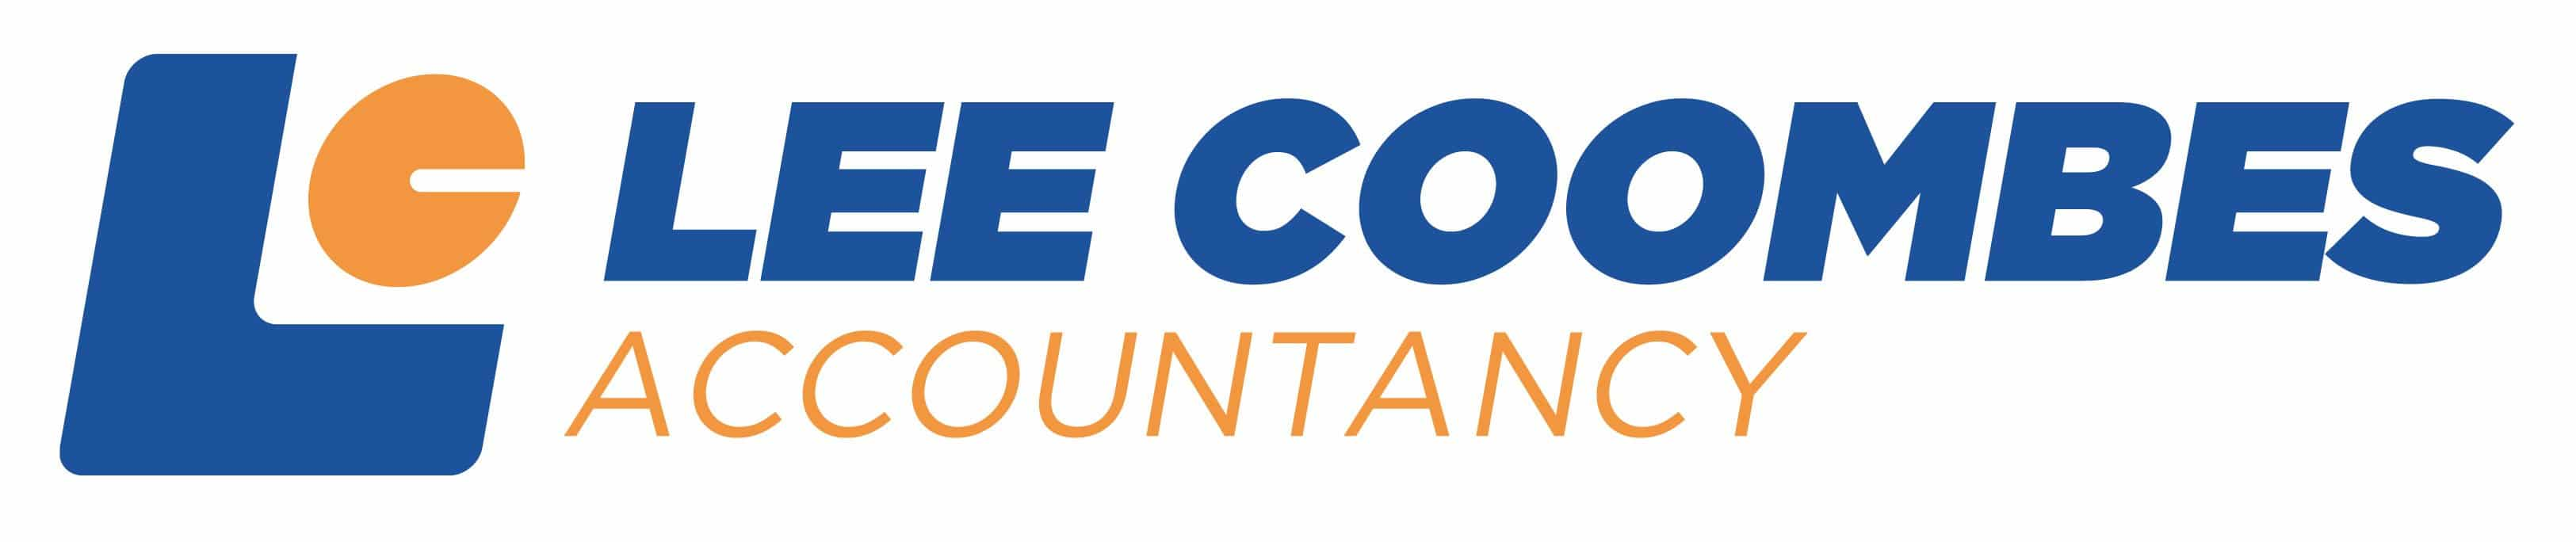 Lee_Coombes_Accountancy_Logo